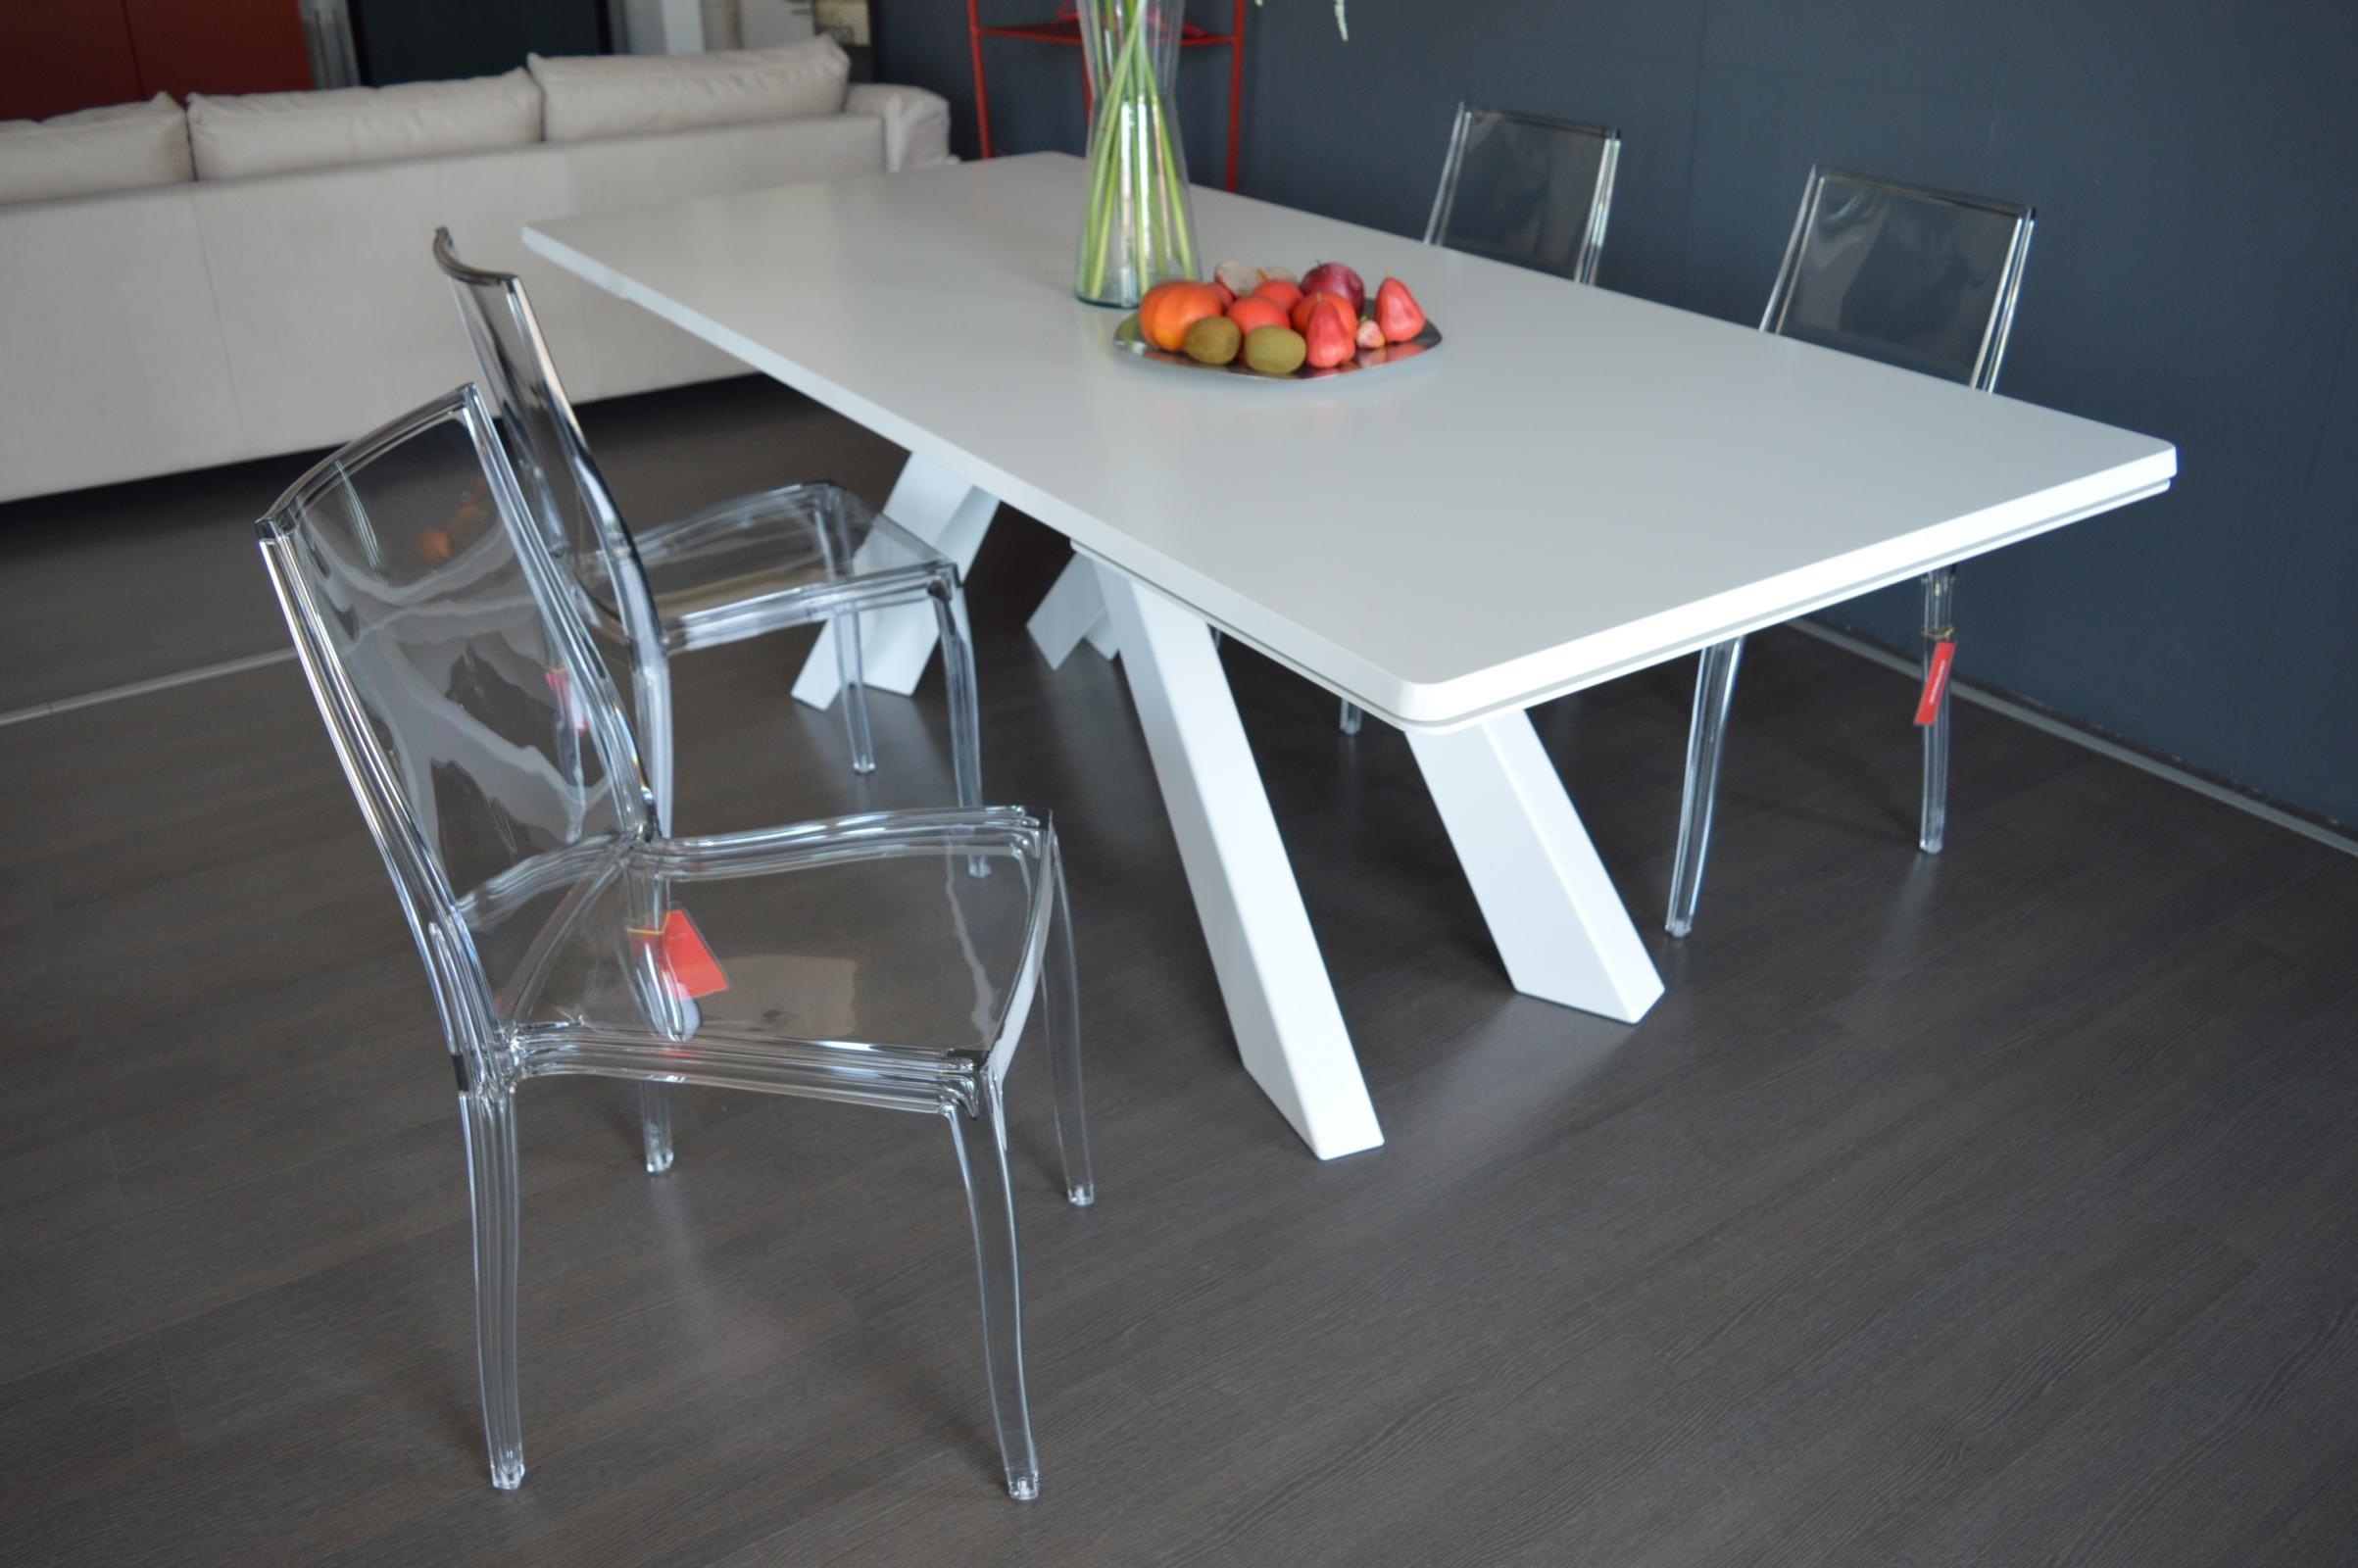 Ikea credenze - Sedia trasparente ikea ...